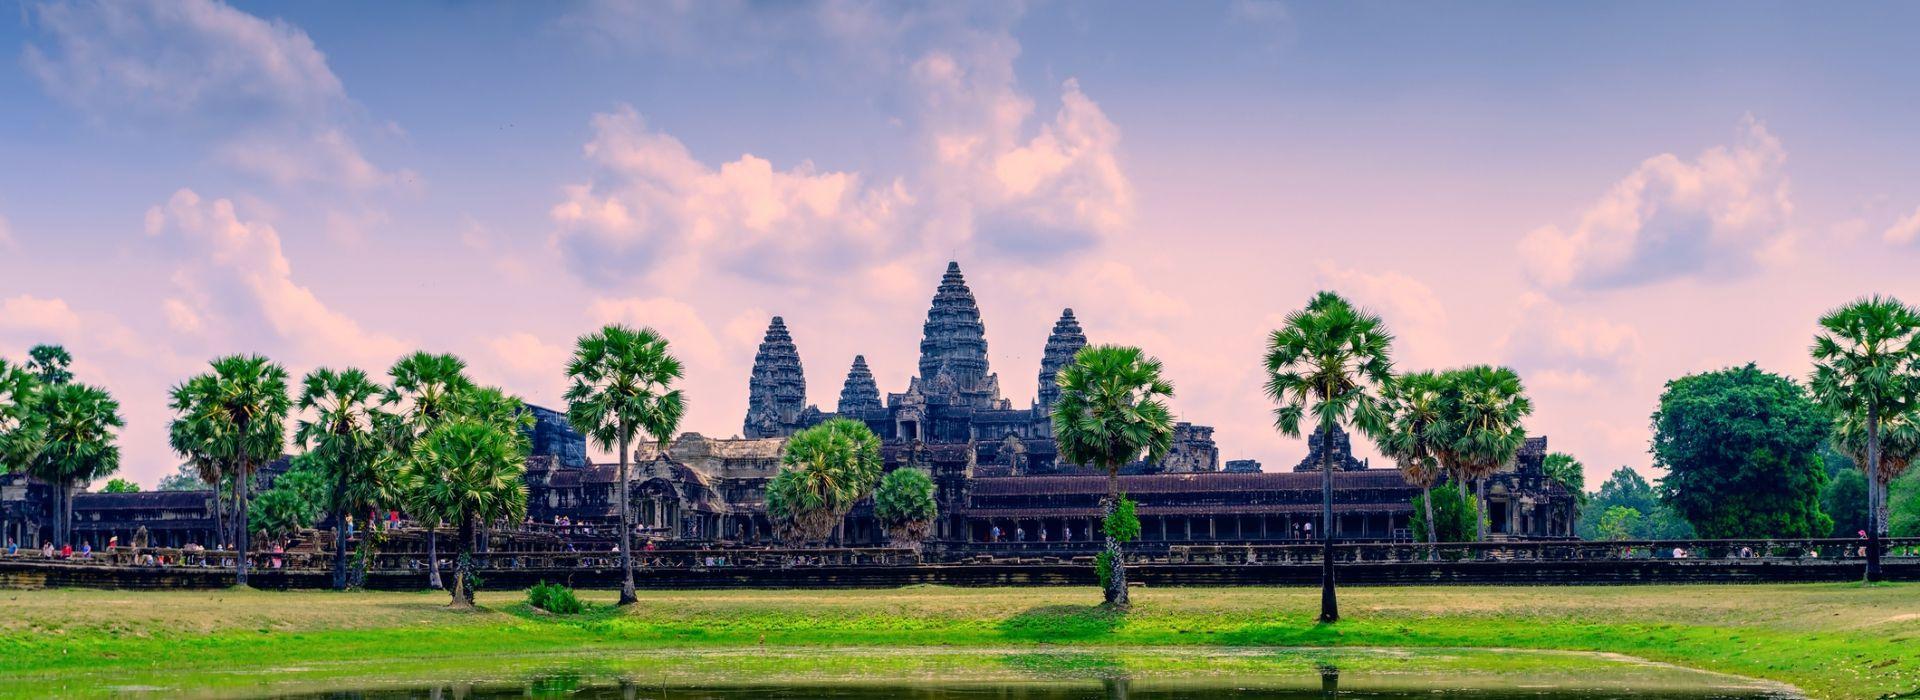 4x4, quad and ATV trips Tours in Cambodia